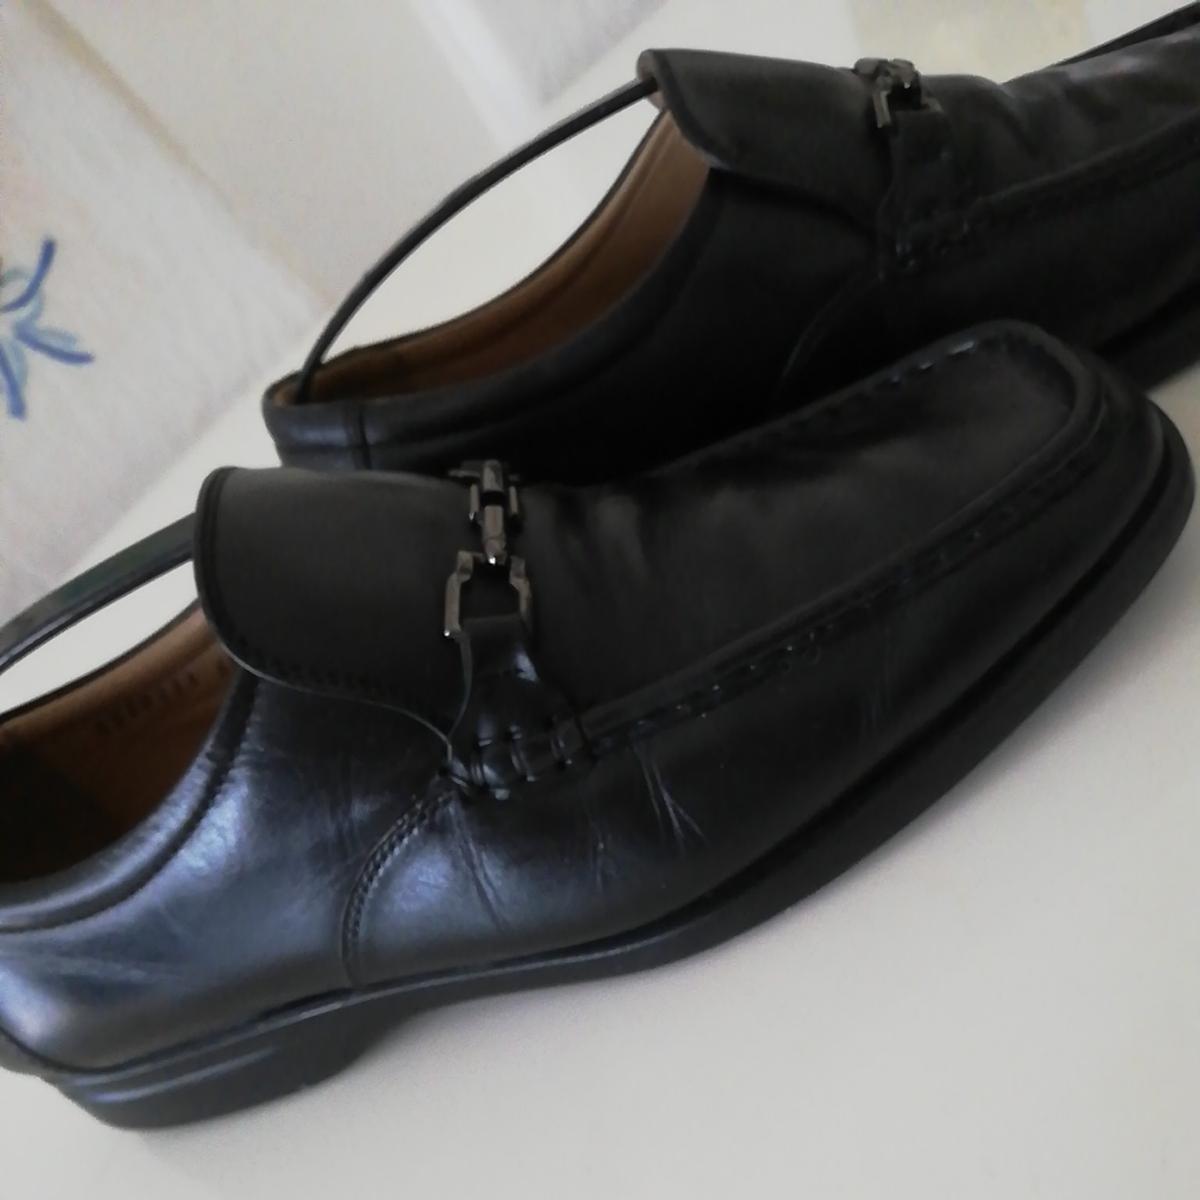 ★BURBERRY LONDON★26cm レザービットローファー バーバリーロンドン メンズ 黒 本革 ビジネスシューズ 本皮 スリッポン 革靴 定番_画像8